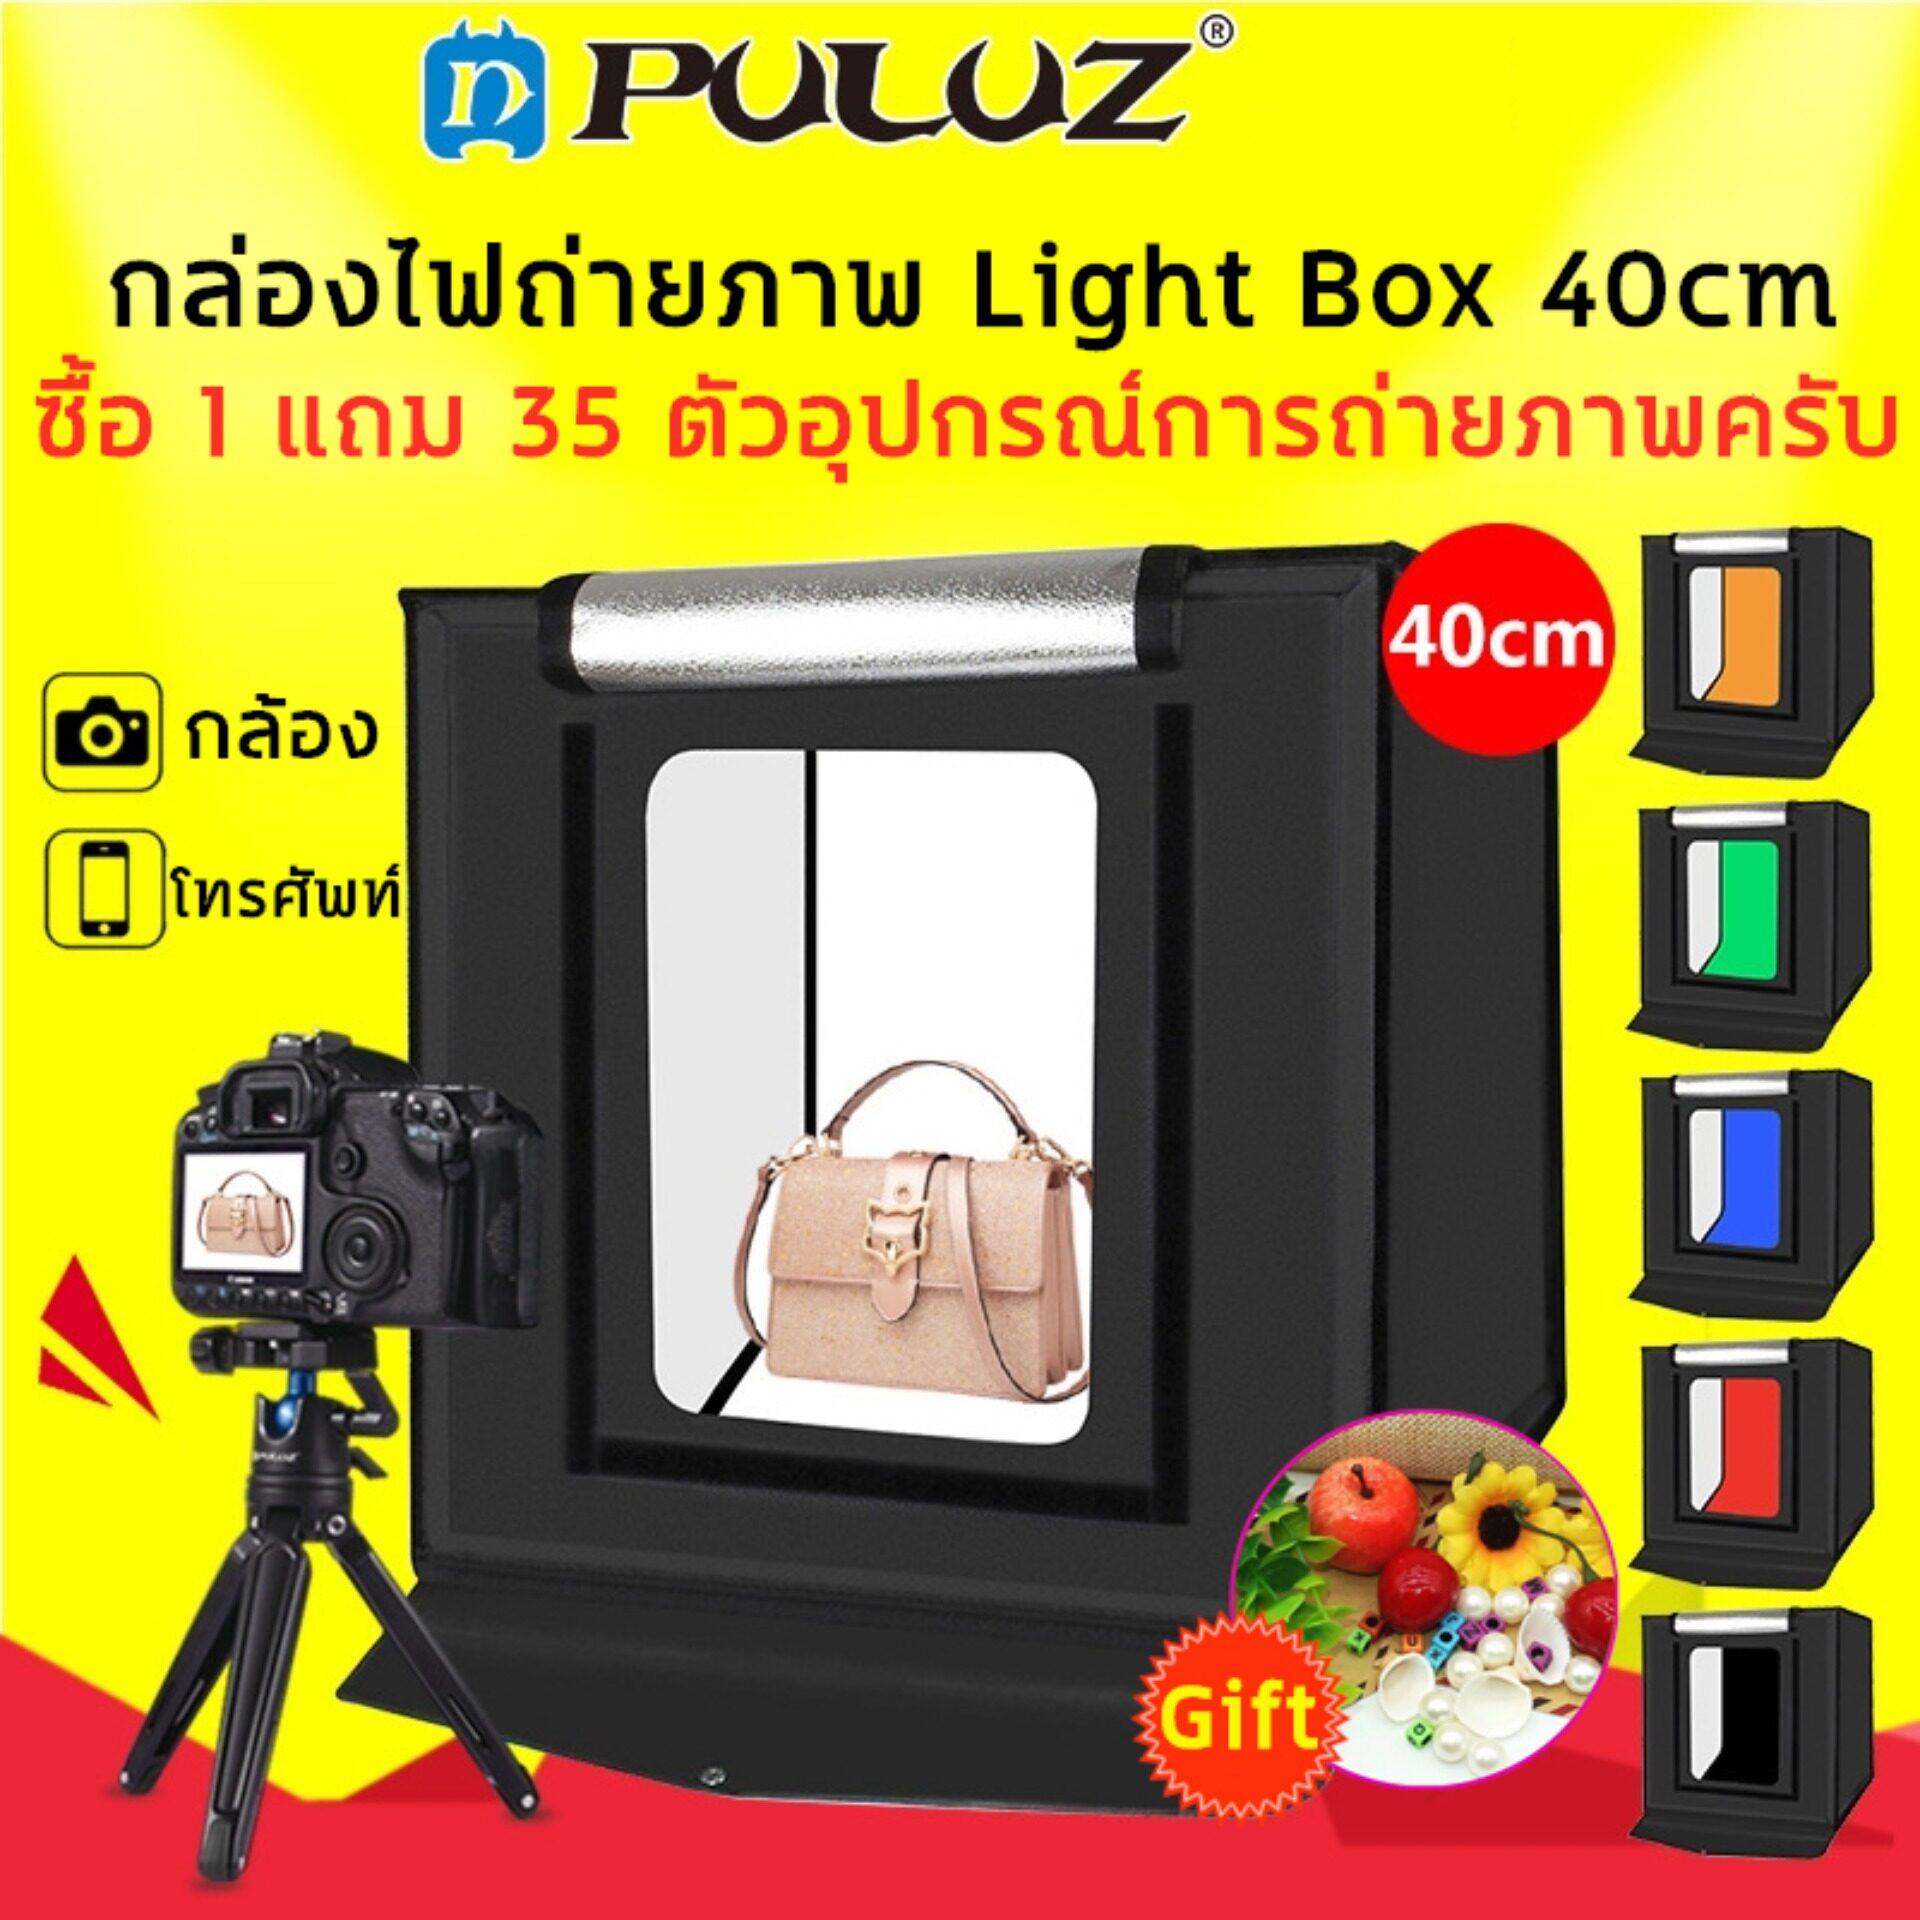 Puluz กล่องไฟถ่ายภาพ Light Box 40 Cm. สตูดิโอถ่ายภาพ กล่องถ่ายรูปสินค้า 40ซม กล่องสำหรับถ่ายภาพสินค้า พร้อมไฟ Led ปรับไฟได้.studio Box Led.